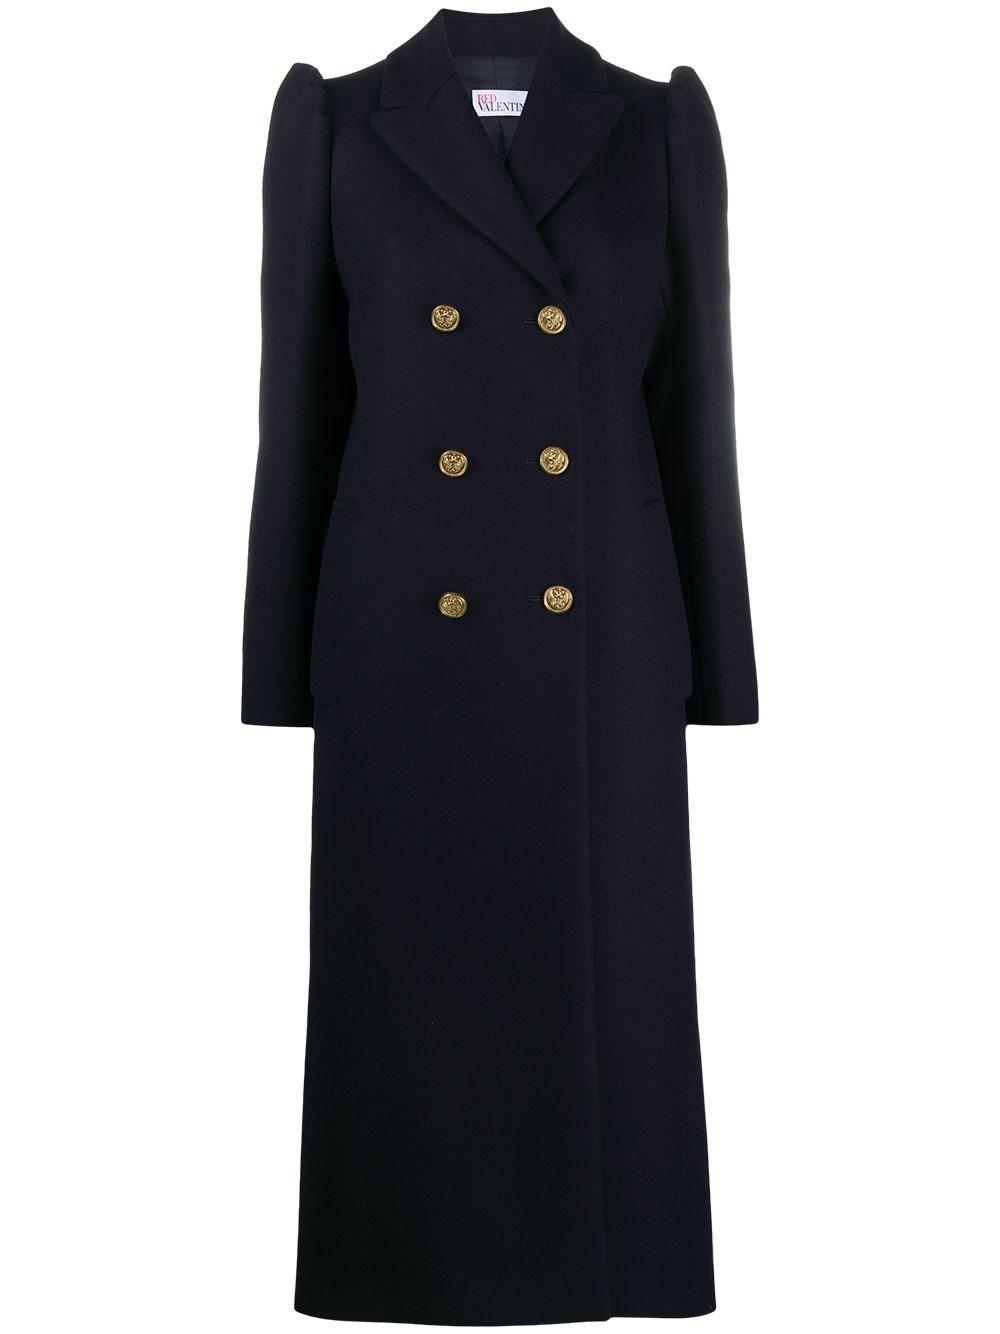 REDVALENTINO Tailored Coat